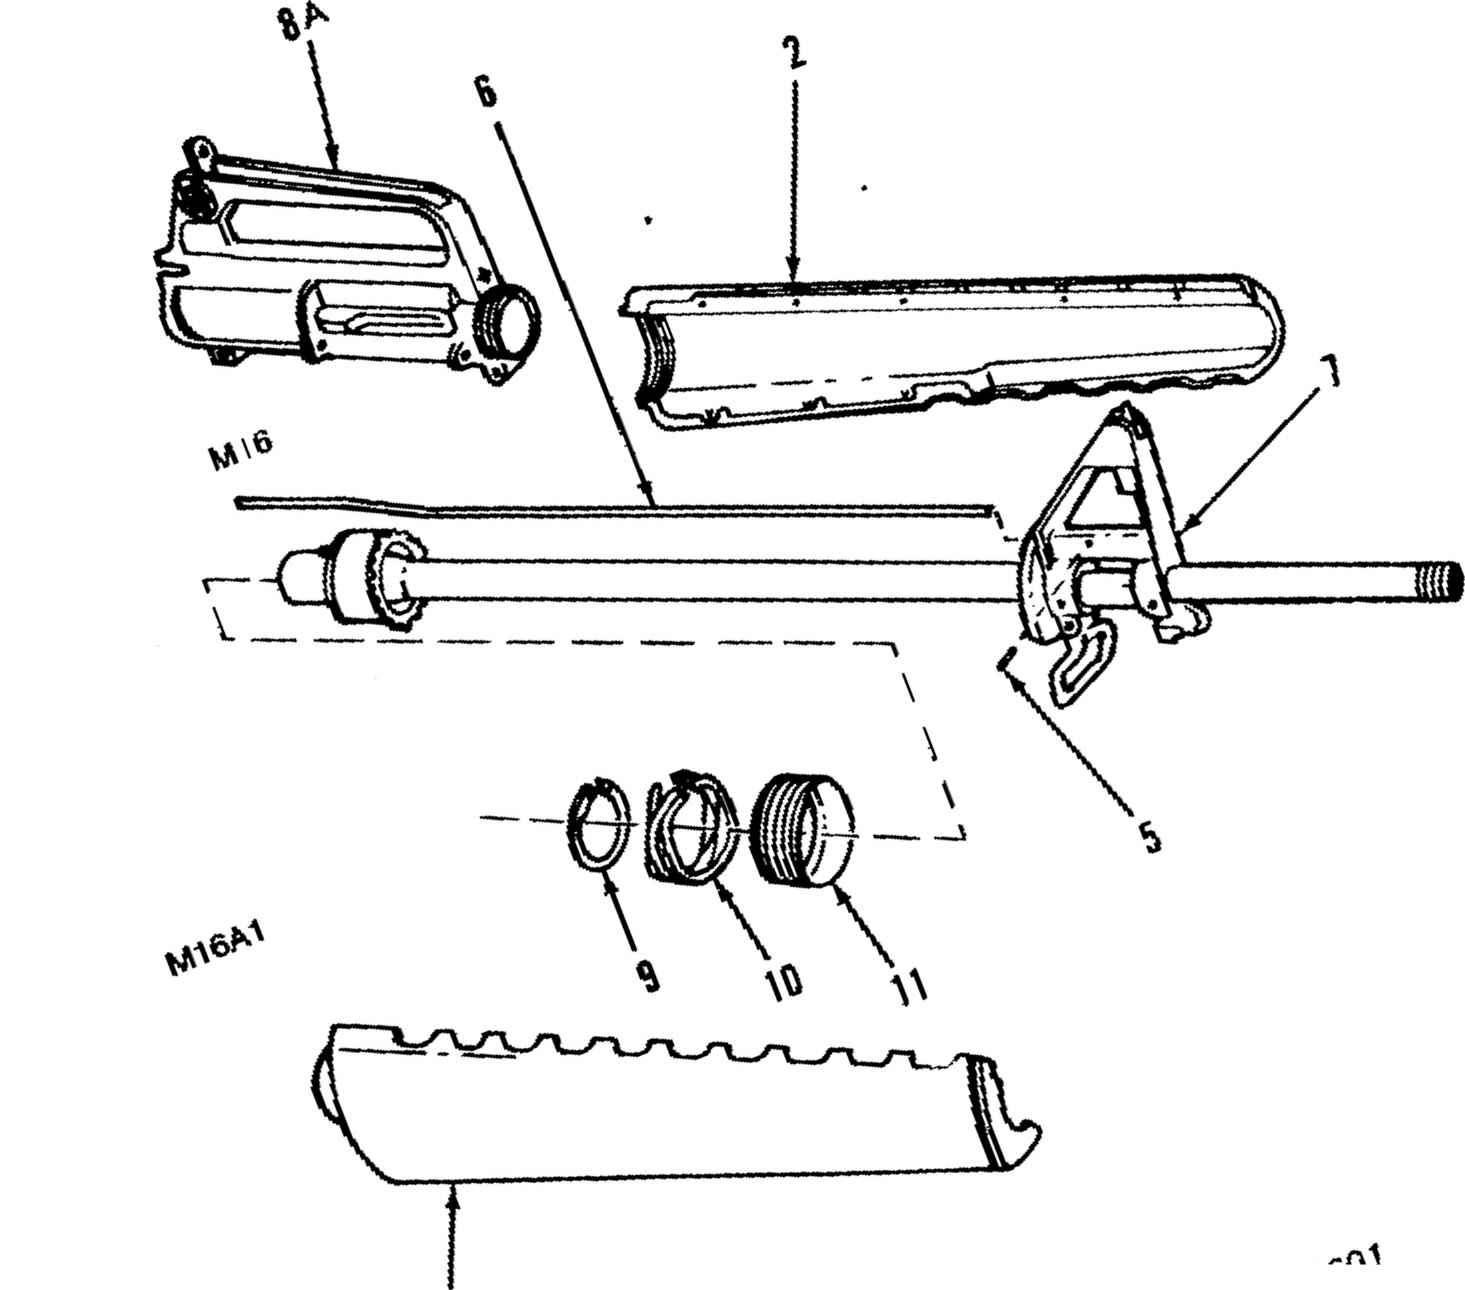 M16a1 Diagram